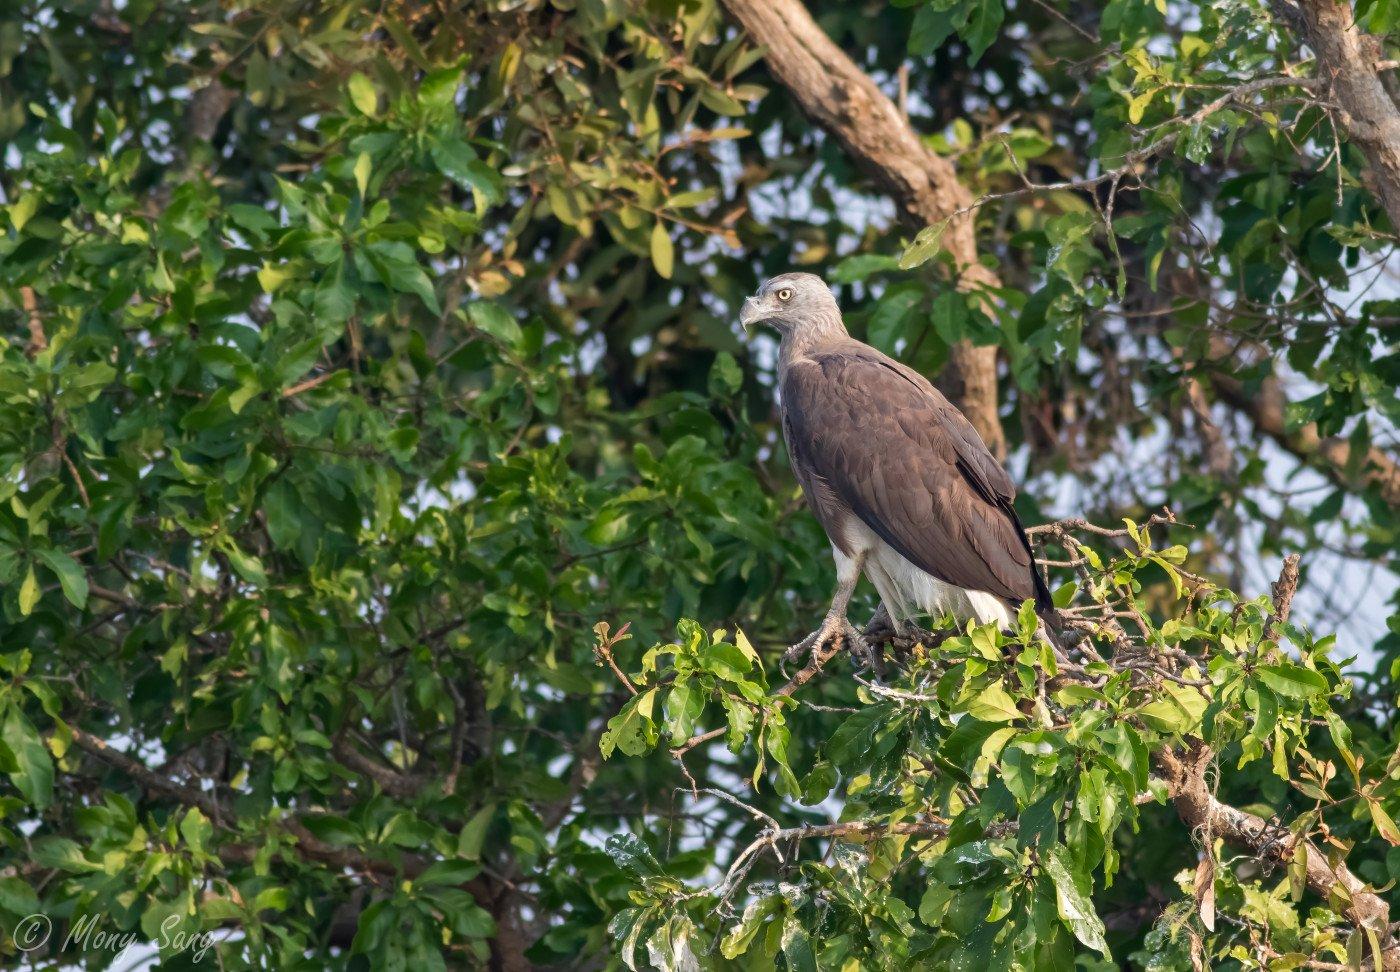 Long-tailed broadbill_Bokor_Sok Panhavuth_26 Apr 2018